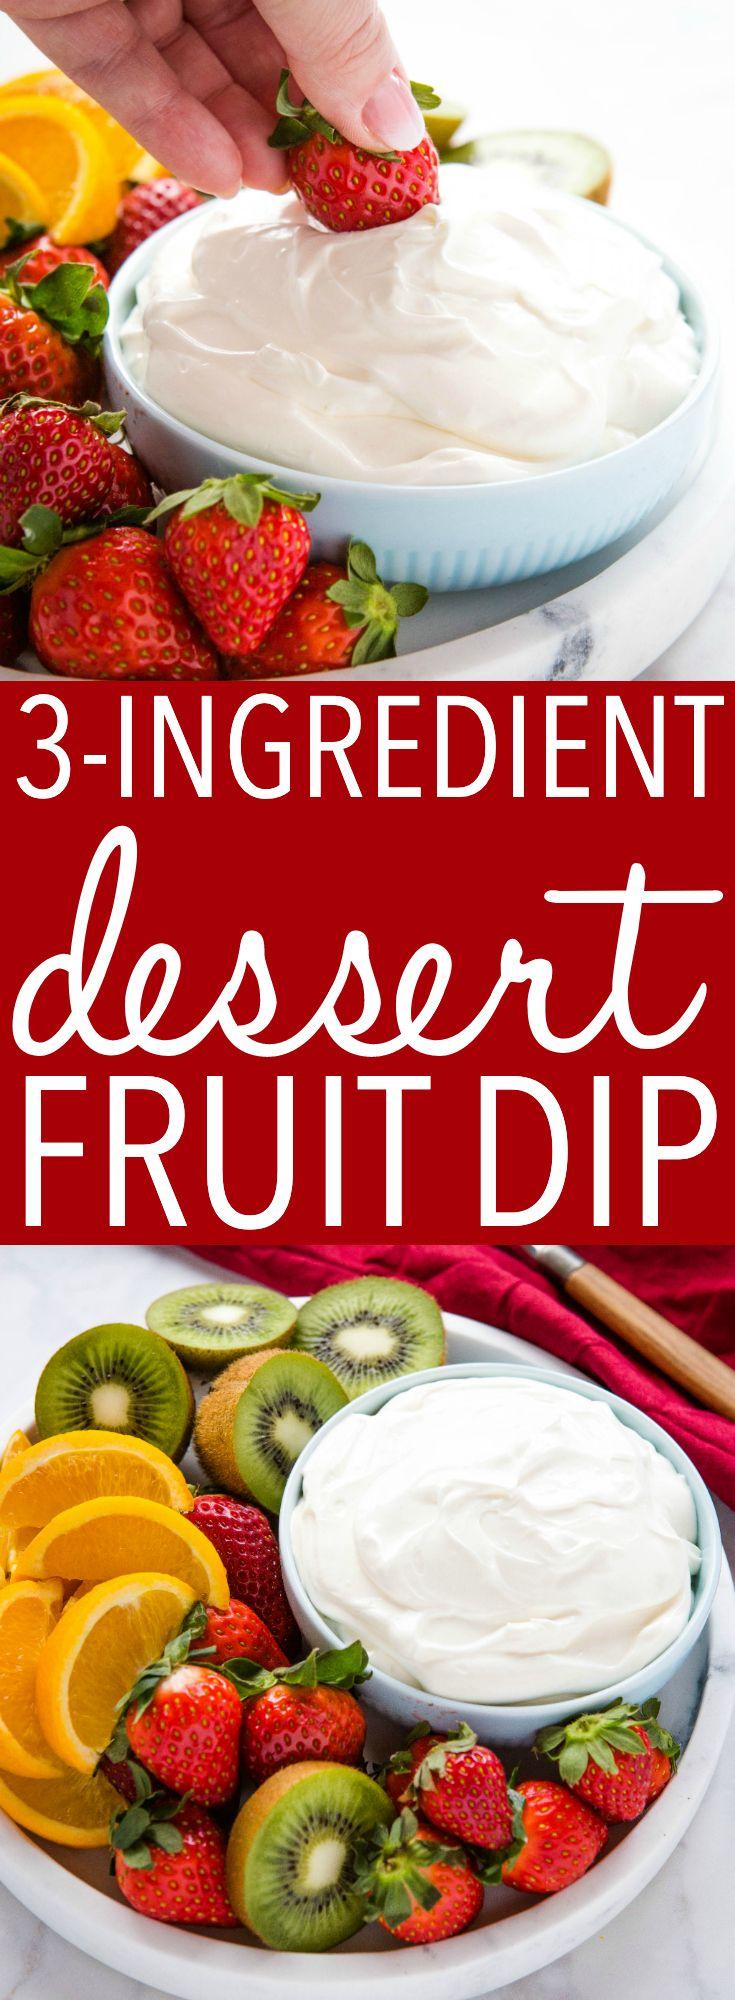 3 Ingredient Fruit Dip Easy Summer Dessert The Busy Baker Recipe In 2020 Barbecue Desserts Desserts Easy Summer Desserts